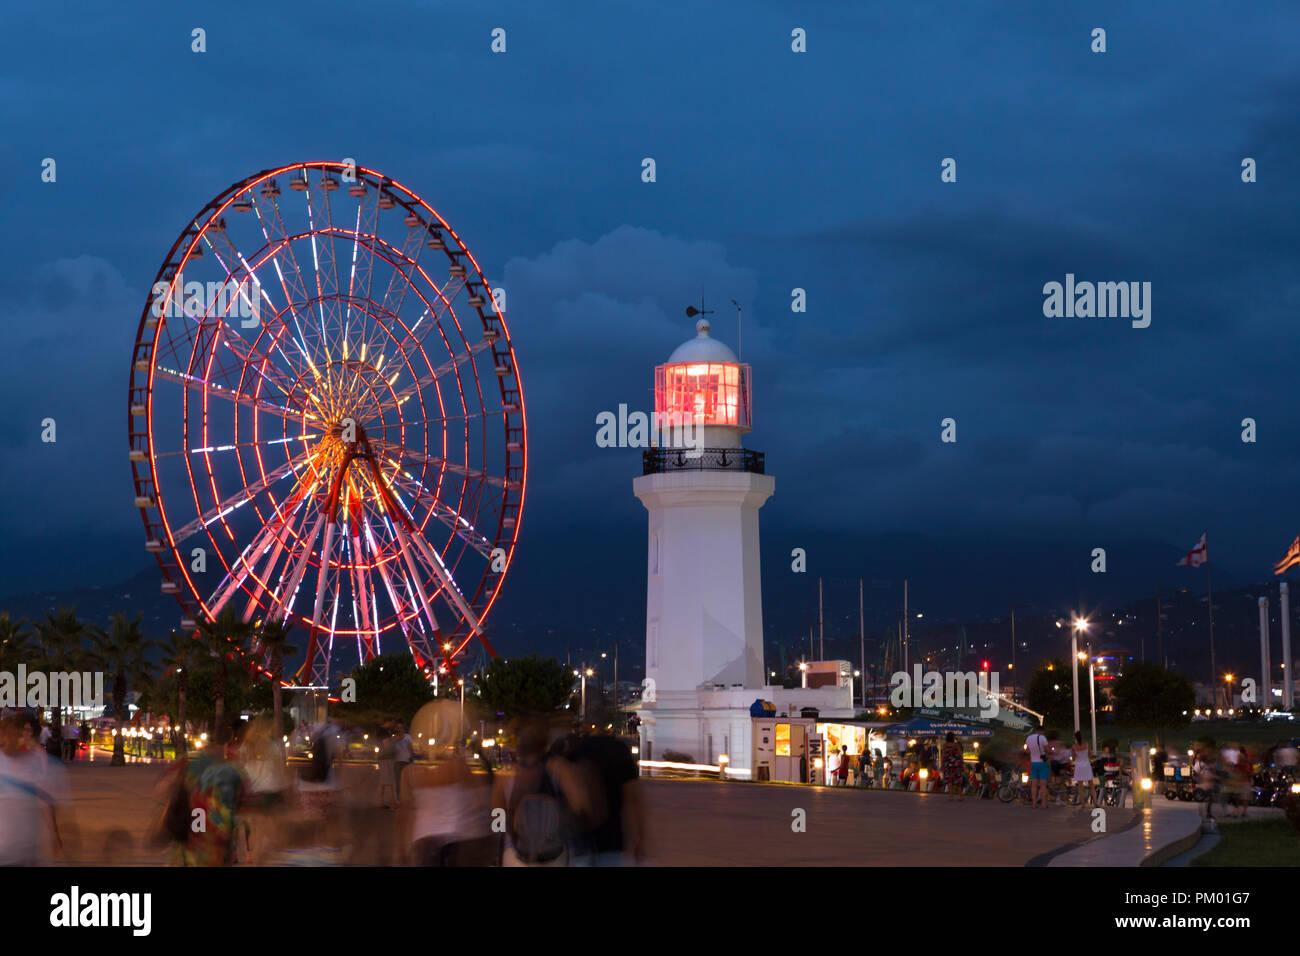 Night view on the illuminated ferris wheel and lighthouse in Batumi, Georgia - Stock Image